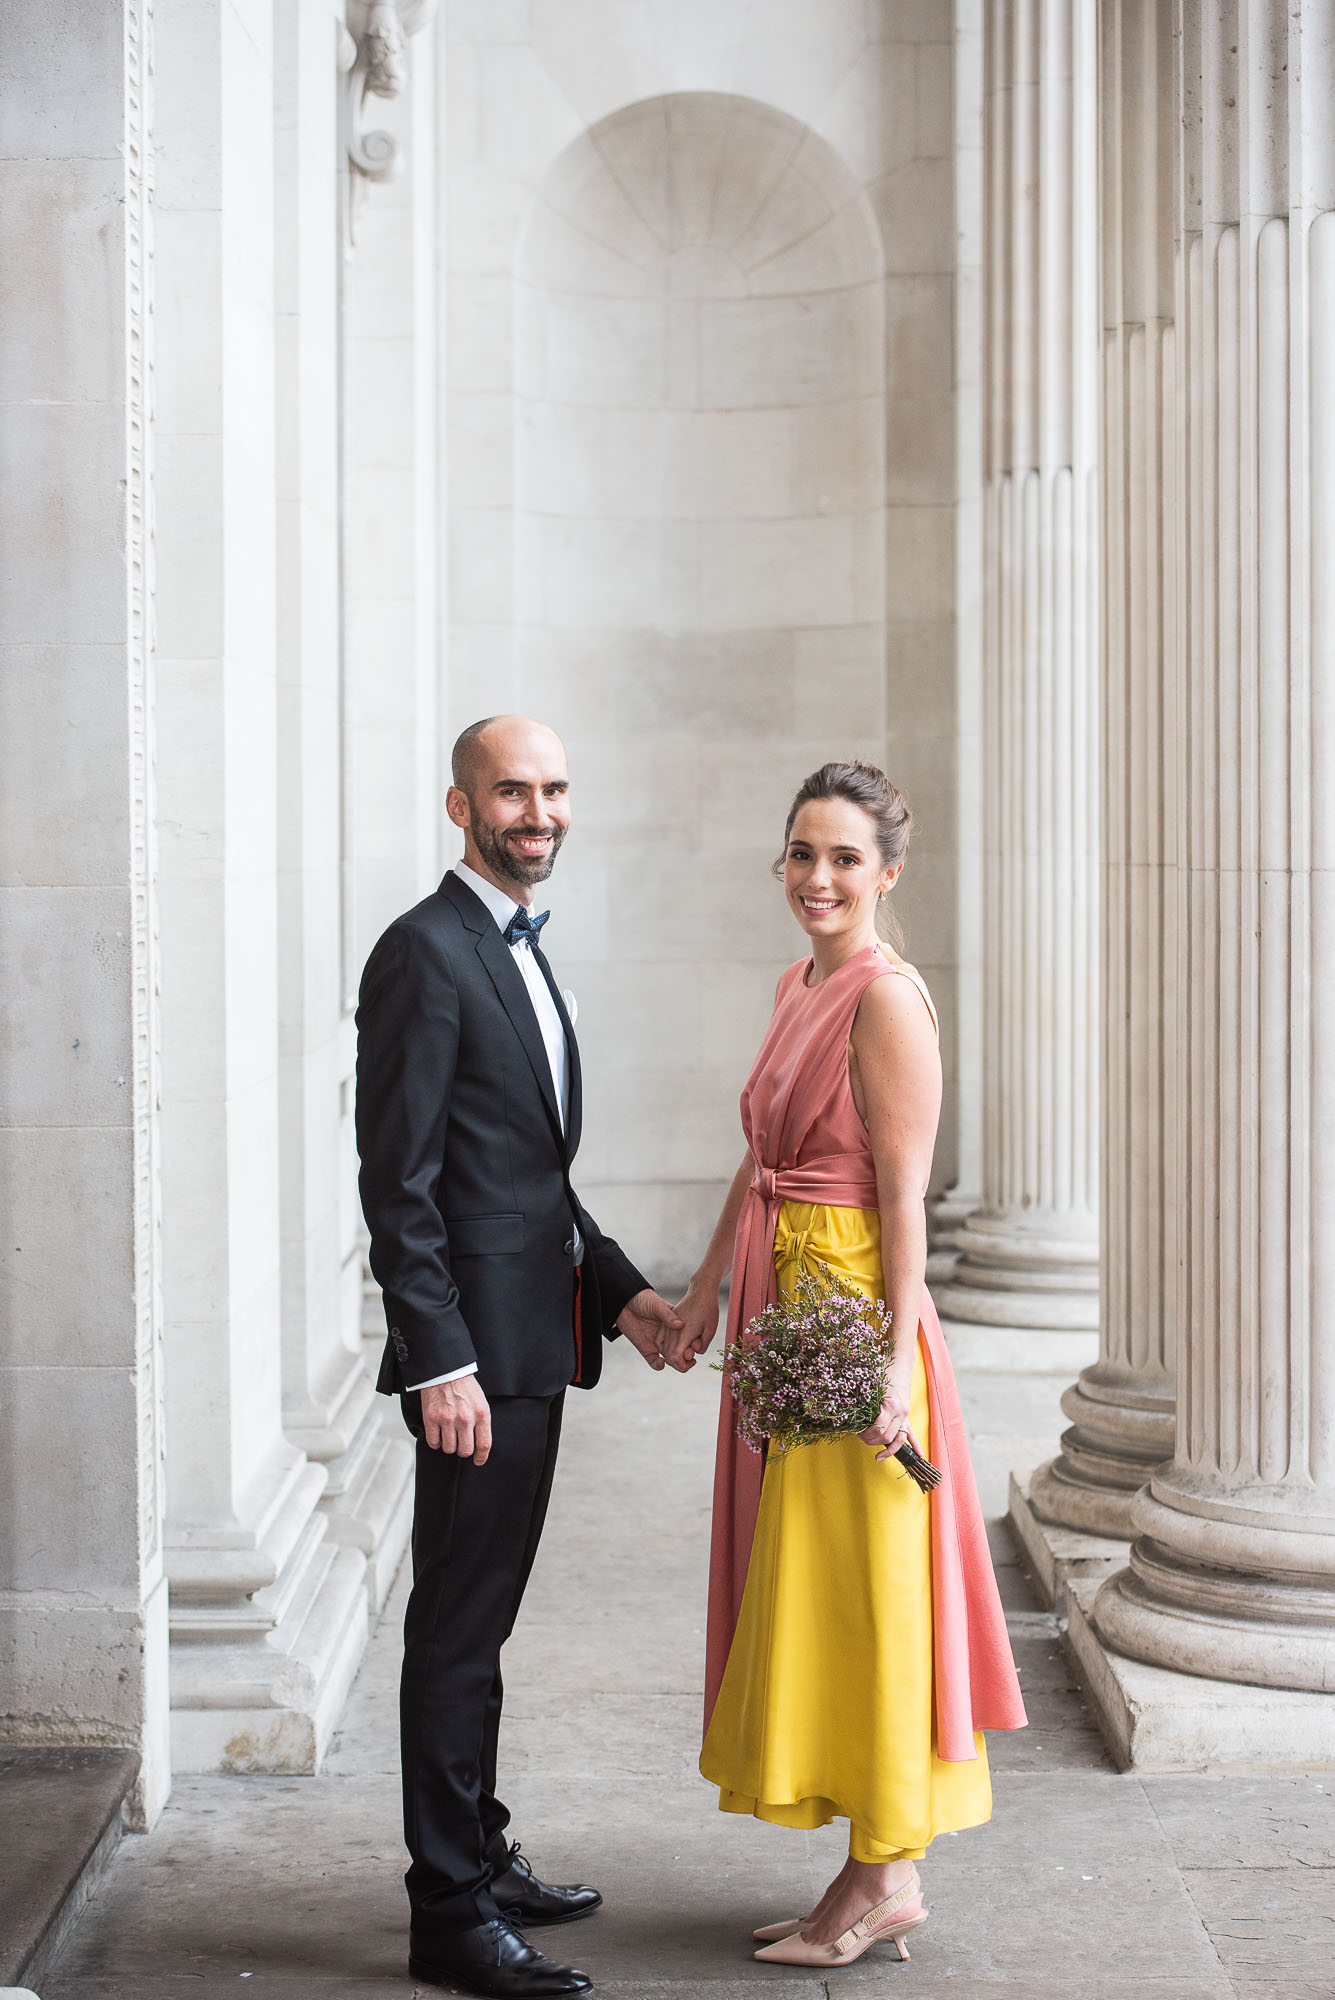 Our Wedding_HR (16 of 176).jpg